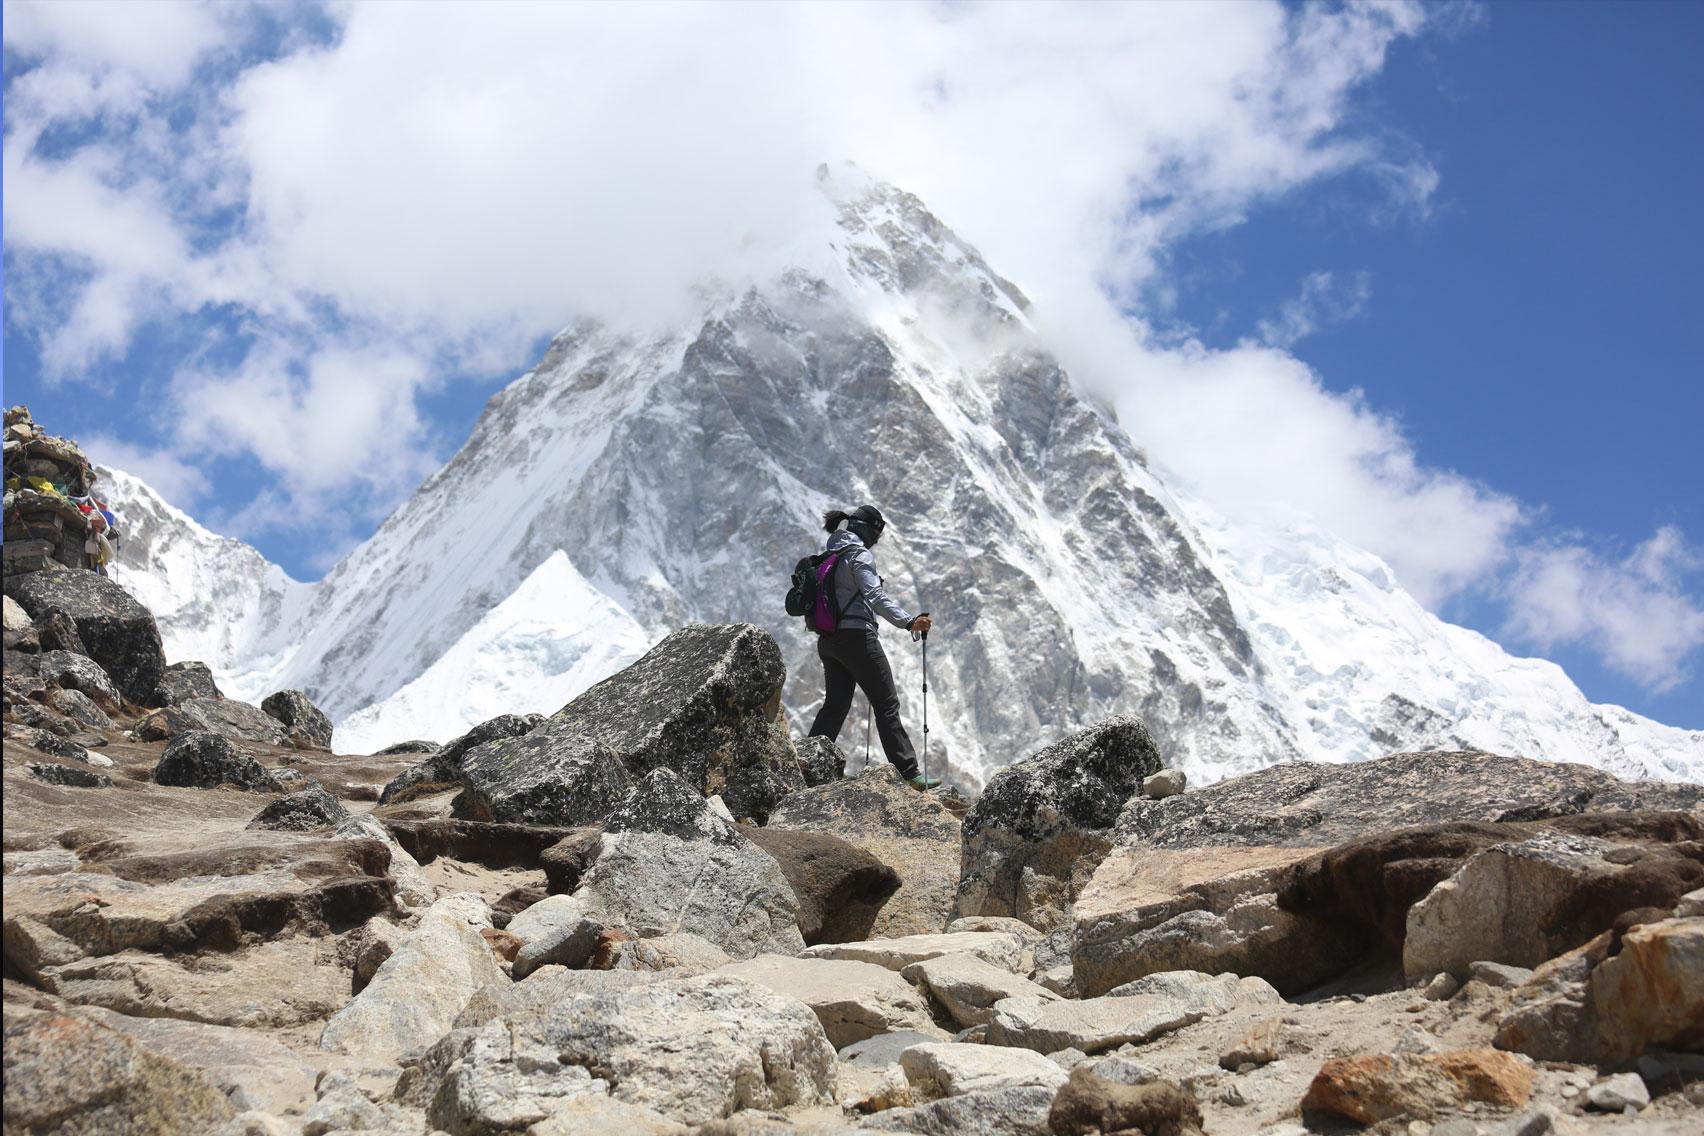 Day 9: Trek from Dingboche (4440m) to Lobuche (6hrs, 4980m)